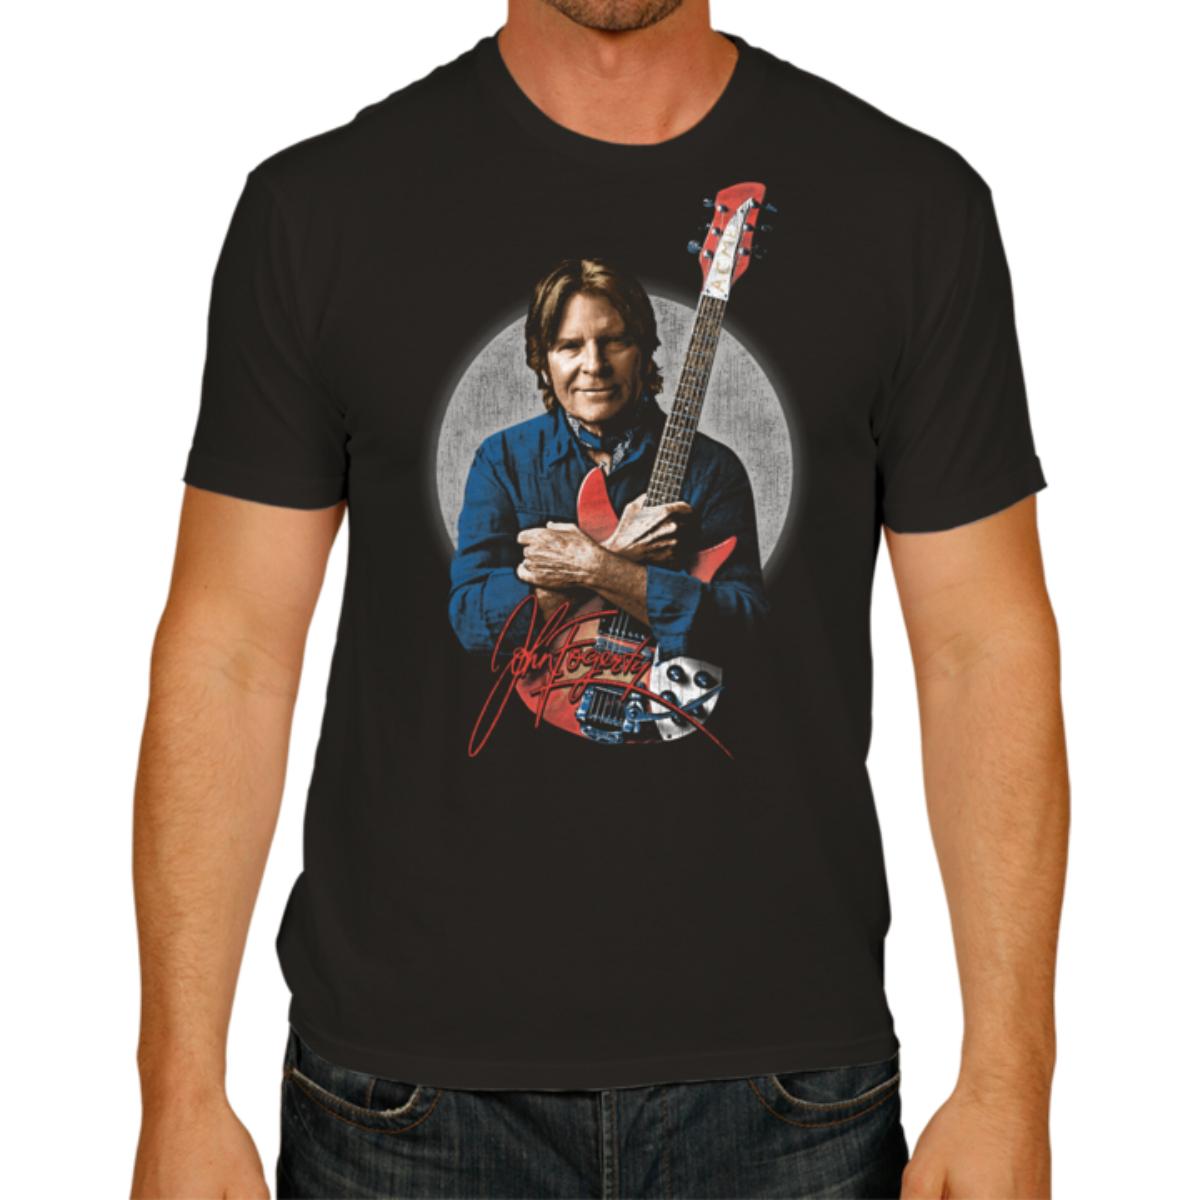 Fogerty Portrait with Signature T-shirt